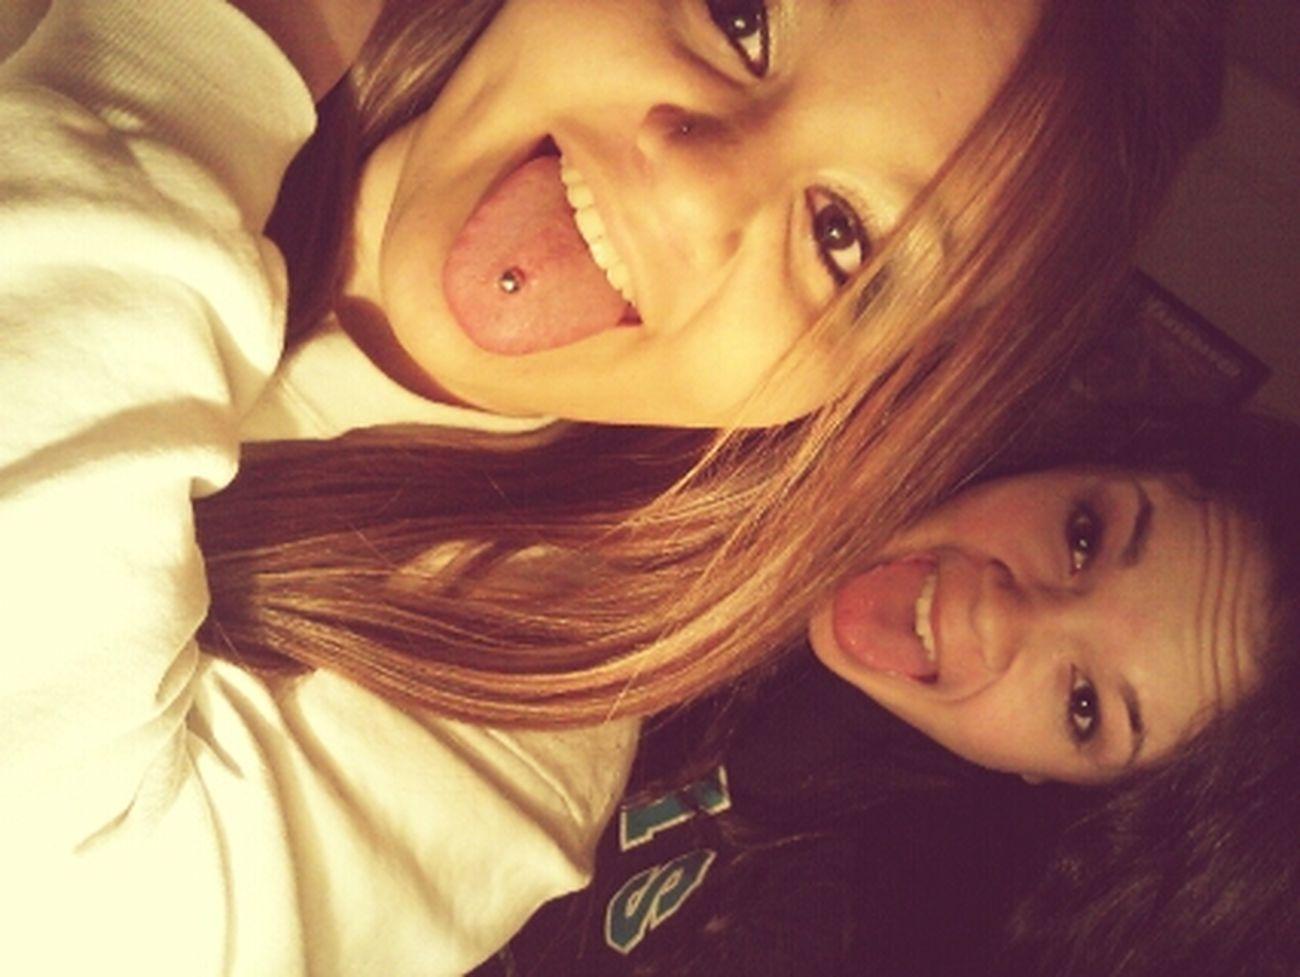 Me & My Sister, Last Night (;